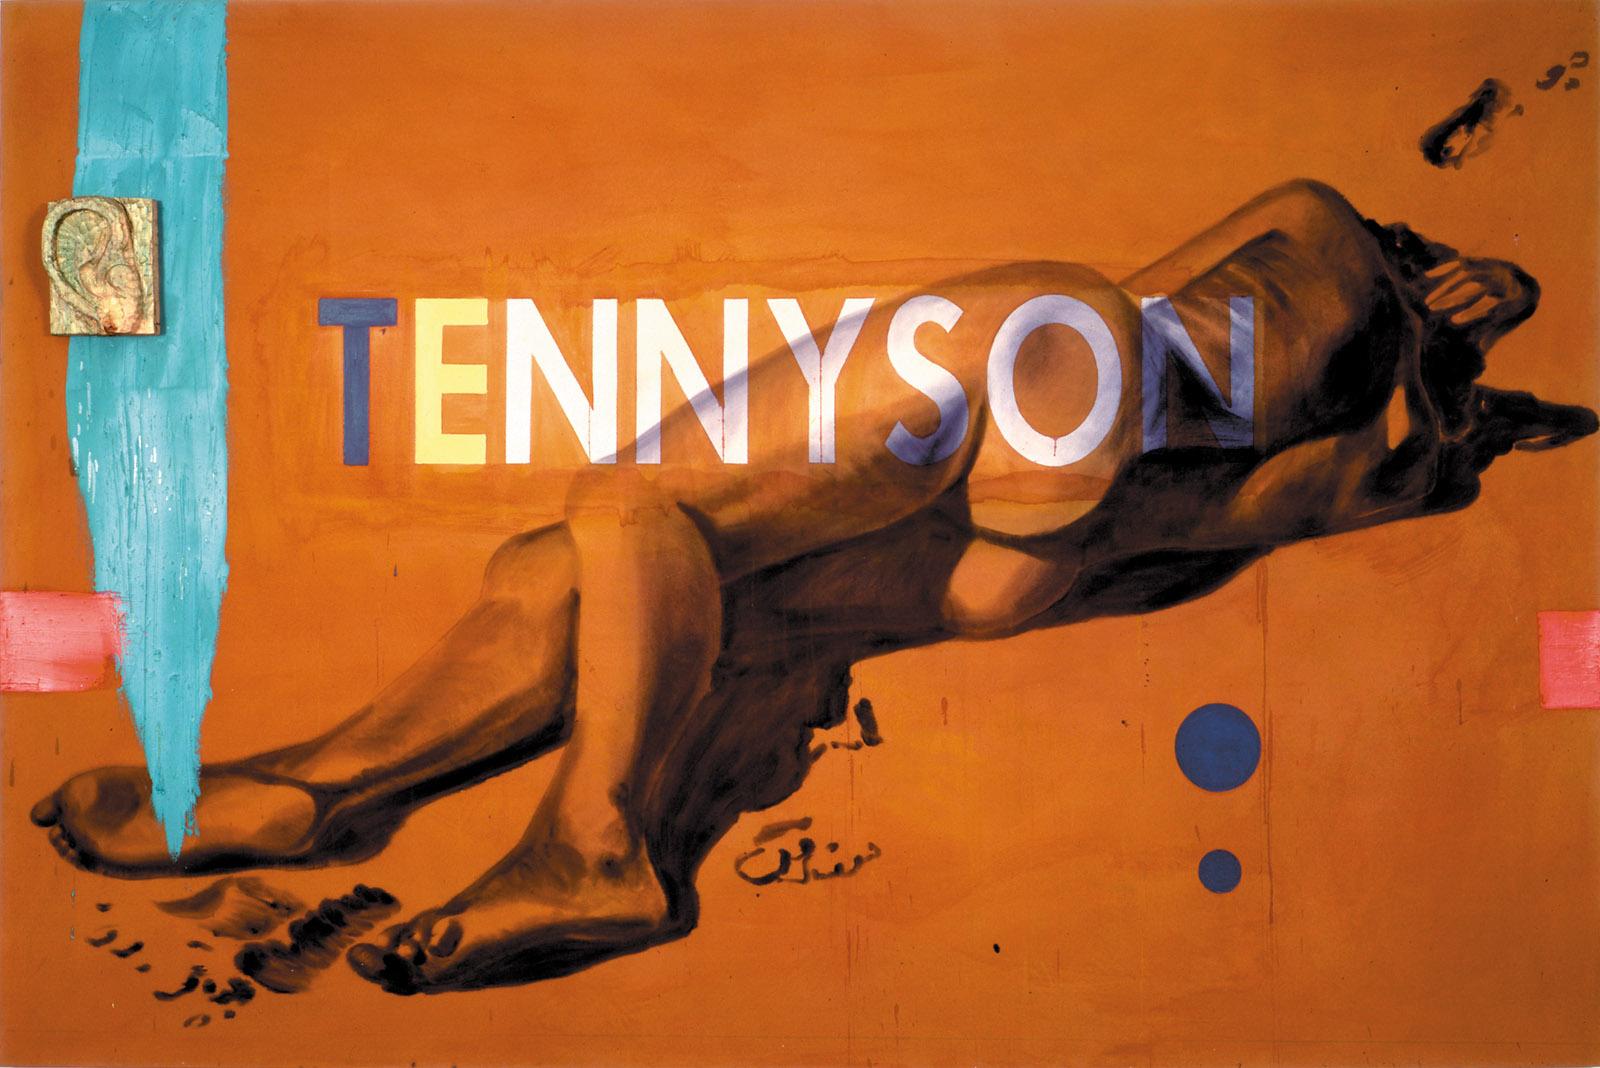 David Salle: Tennyson, 78 x 117 x 5 1/2 inches, 1983